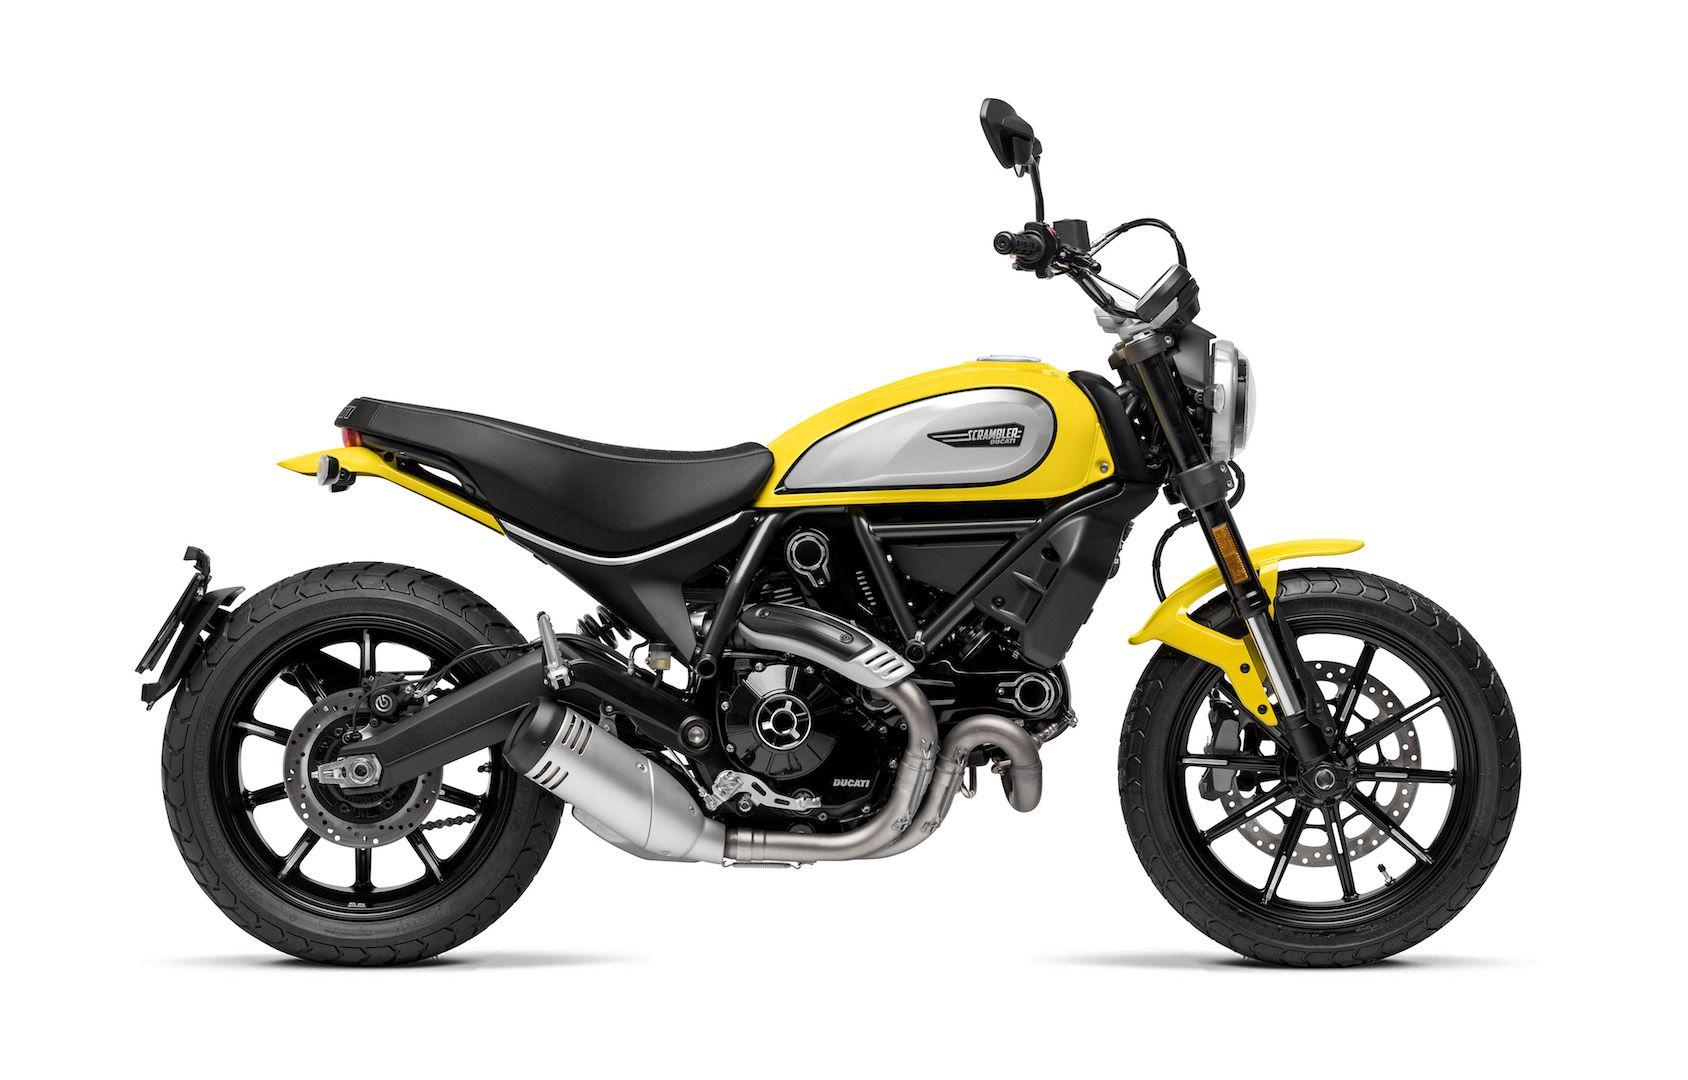 МОТОЦИКЛ DUCATI SCRAMBLER ICON 2021  Артмото - купить квадроцикл в украине и харькове, мотоцикл, снегоход, скутер, мопед, электромобиль